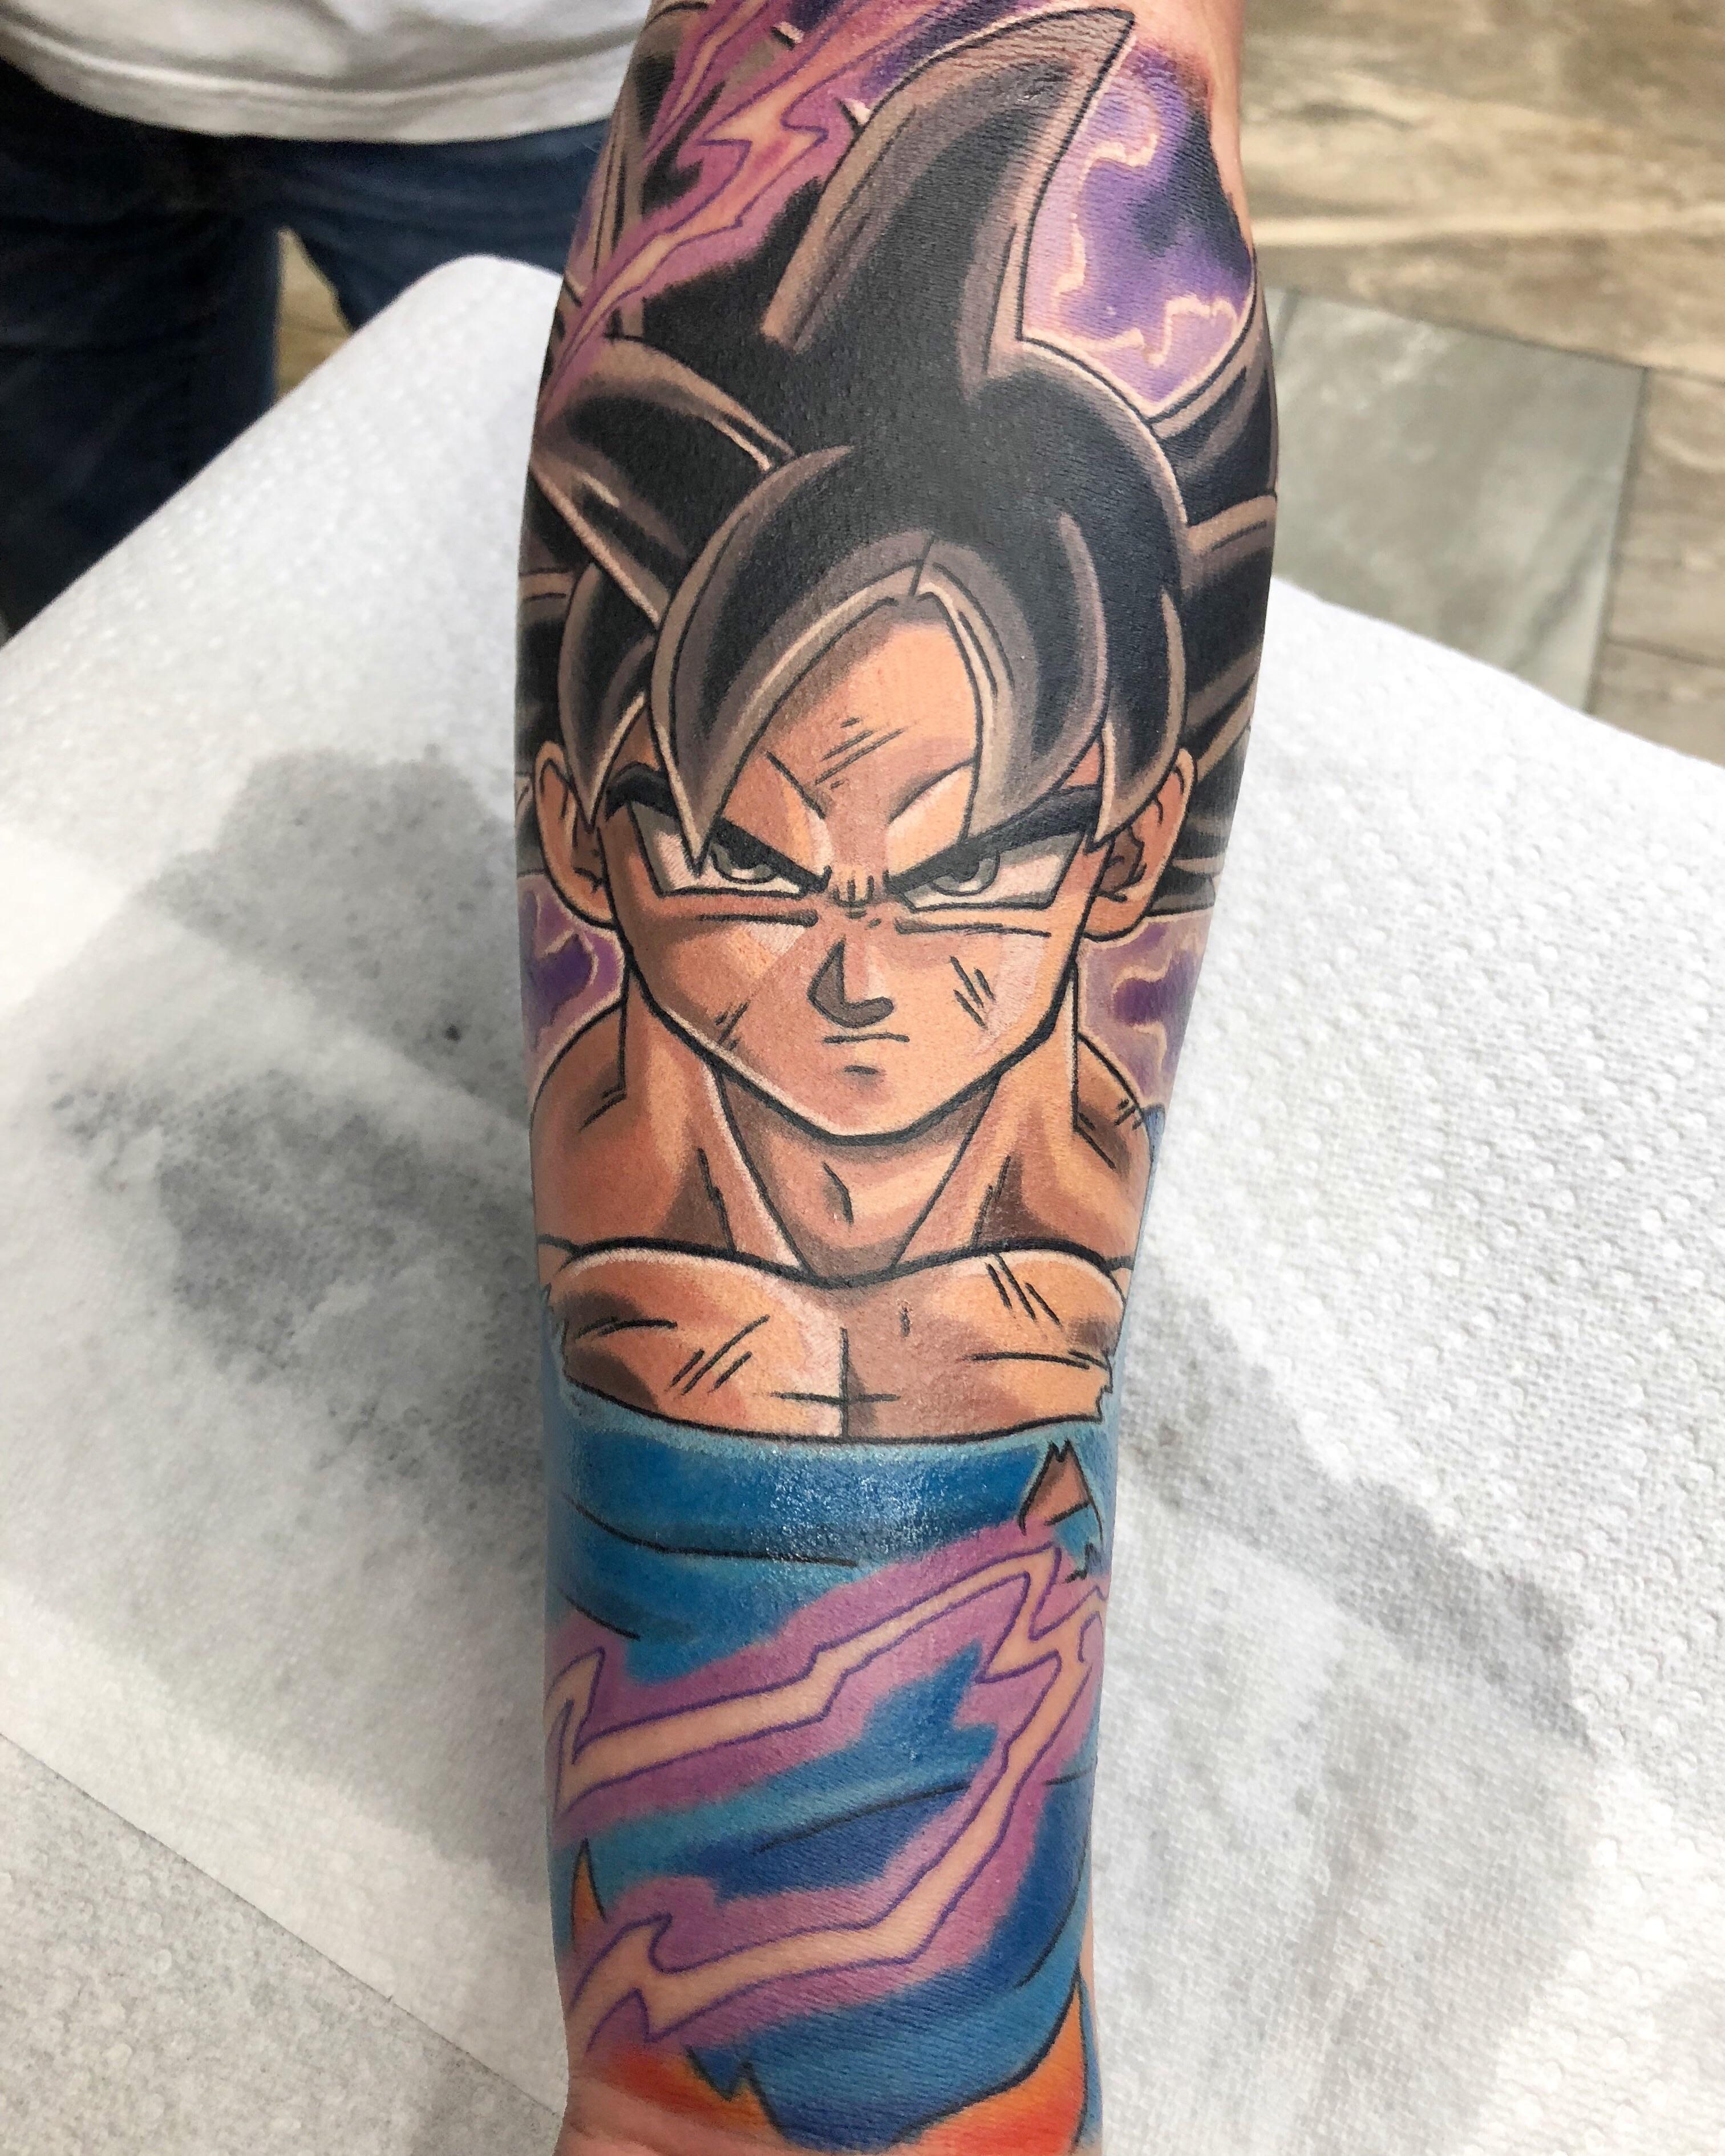 Goku Ultra Instinct Tattoo : ultra, instinct, tattoo, Ultra, Instinct, Andrew, Douglas, Dragon, Tattoo, Cedar, Rapids, Tattoos